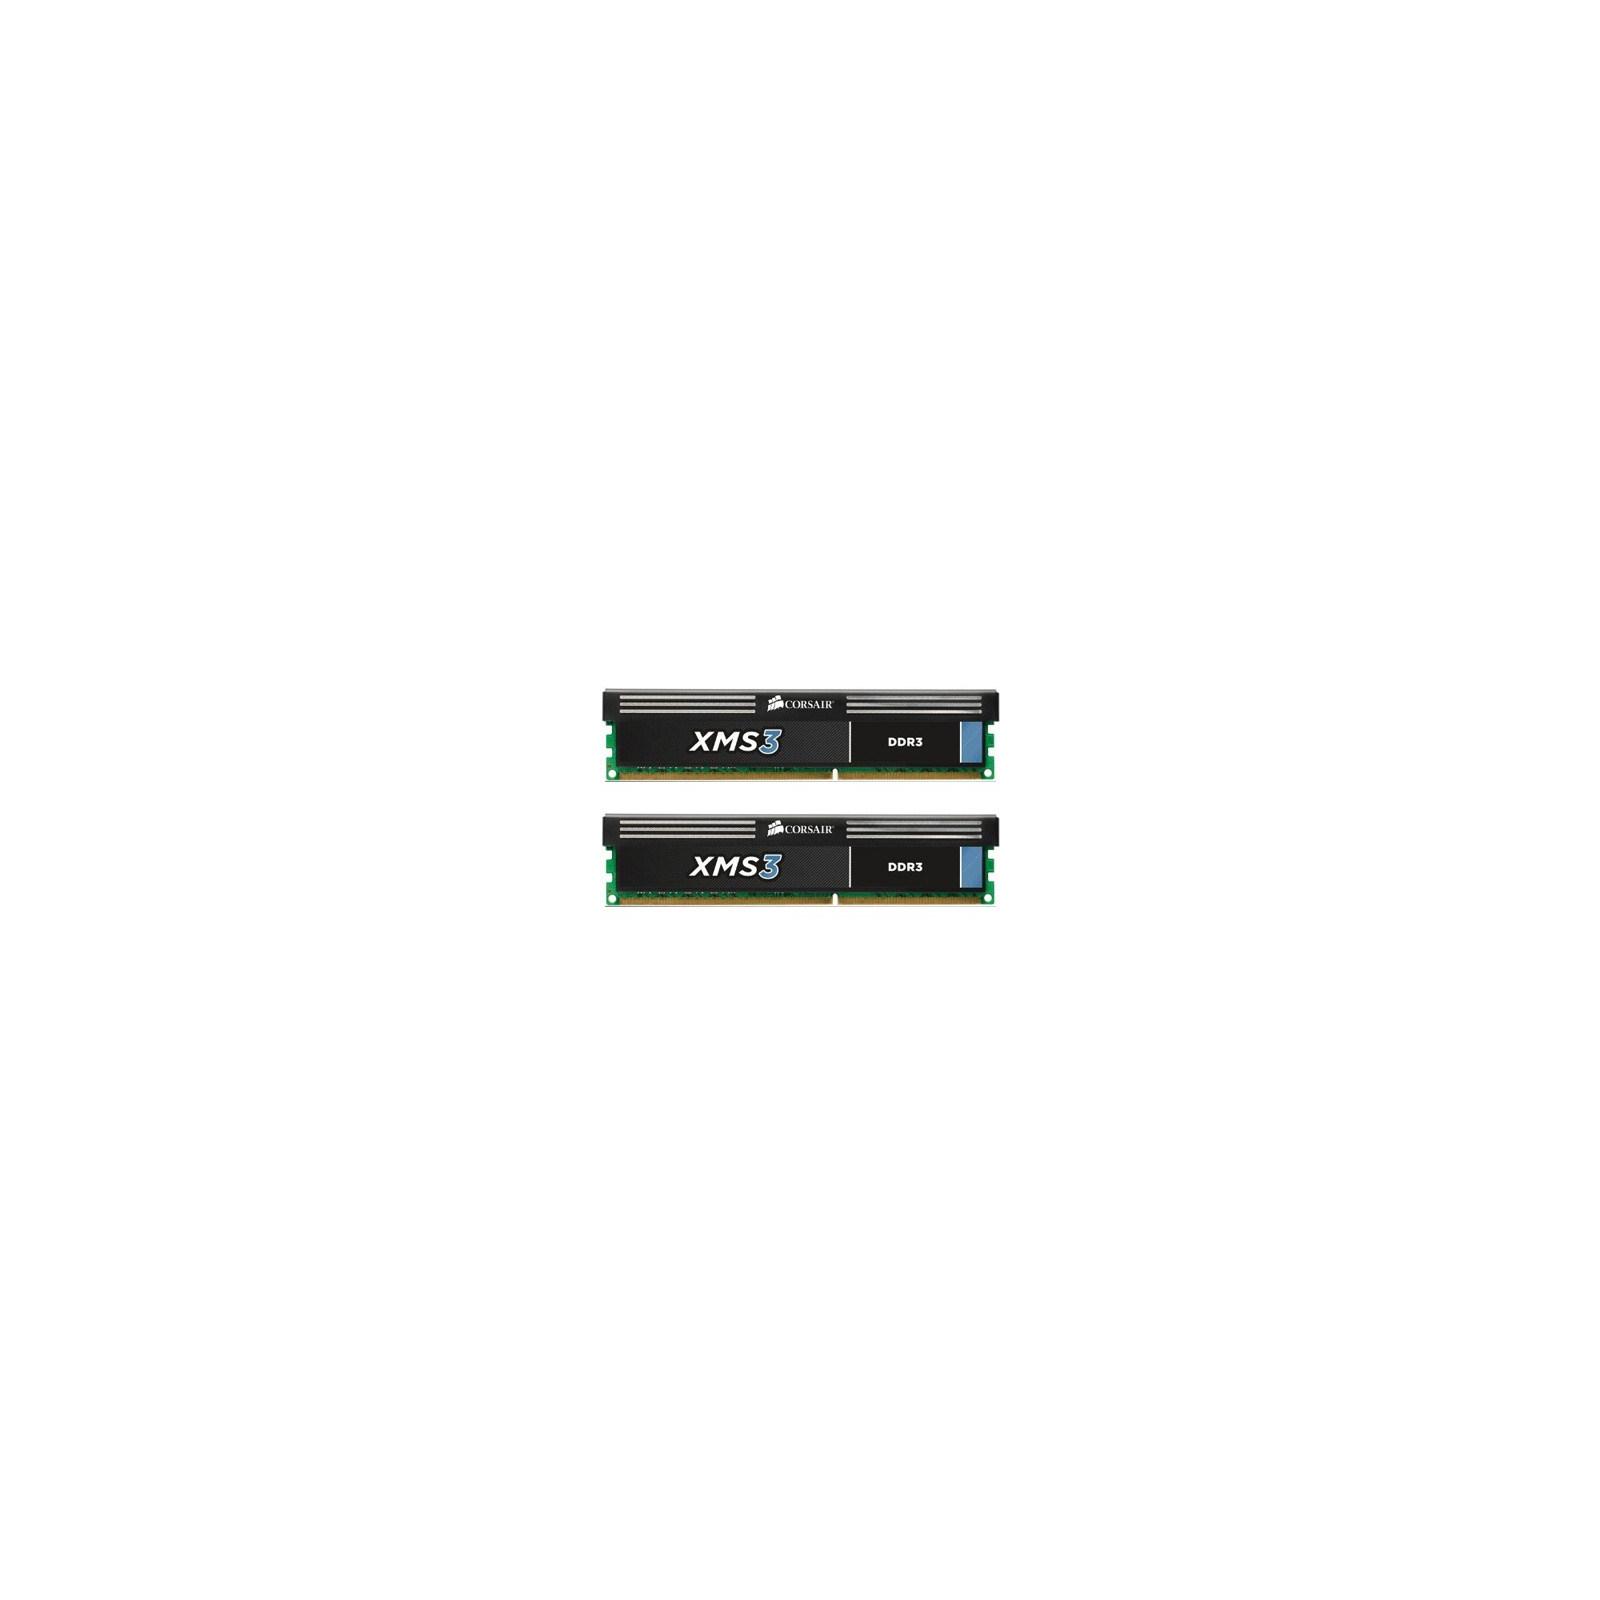 Модуль памяти для компьютера DDR3 16GB (2x8GB) 1600 MHz CORSAIR (CMX16GX3M2A1600C11)